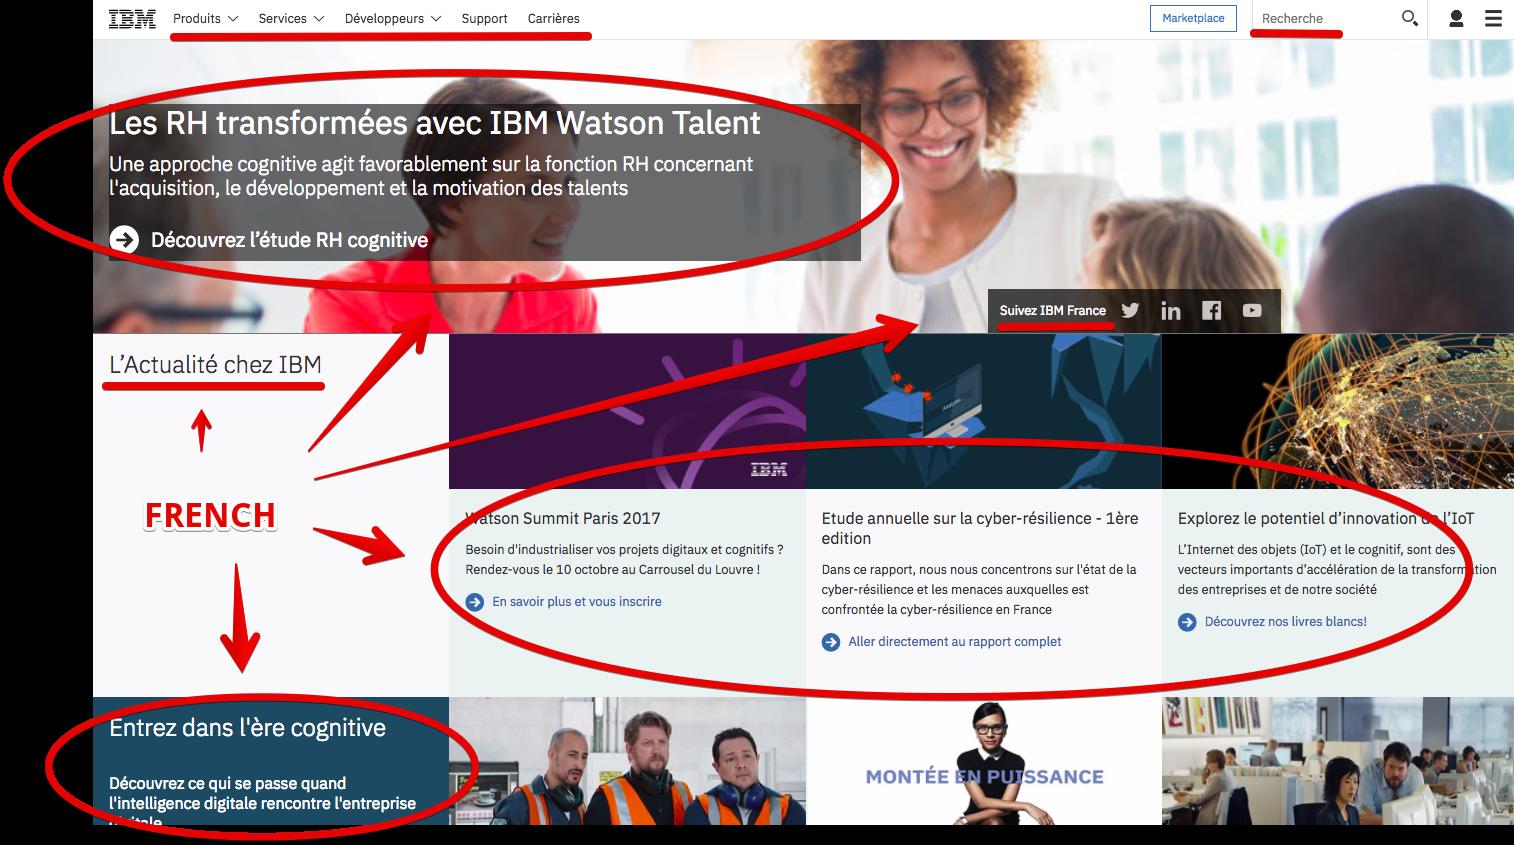 IBM-french-website-version.png